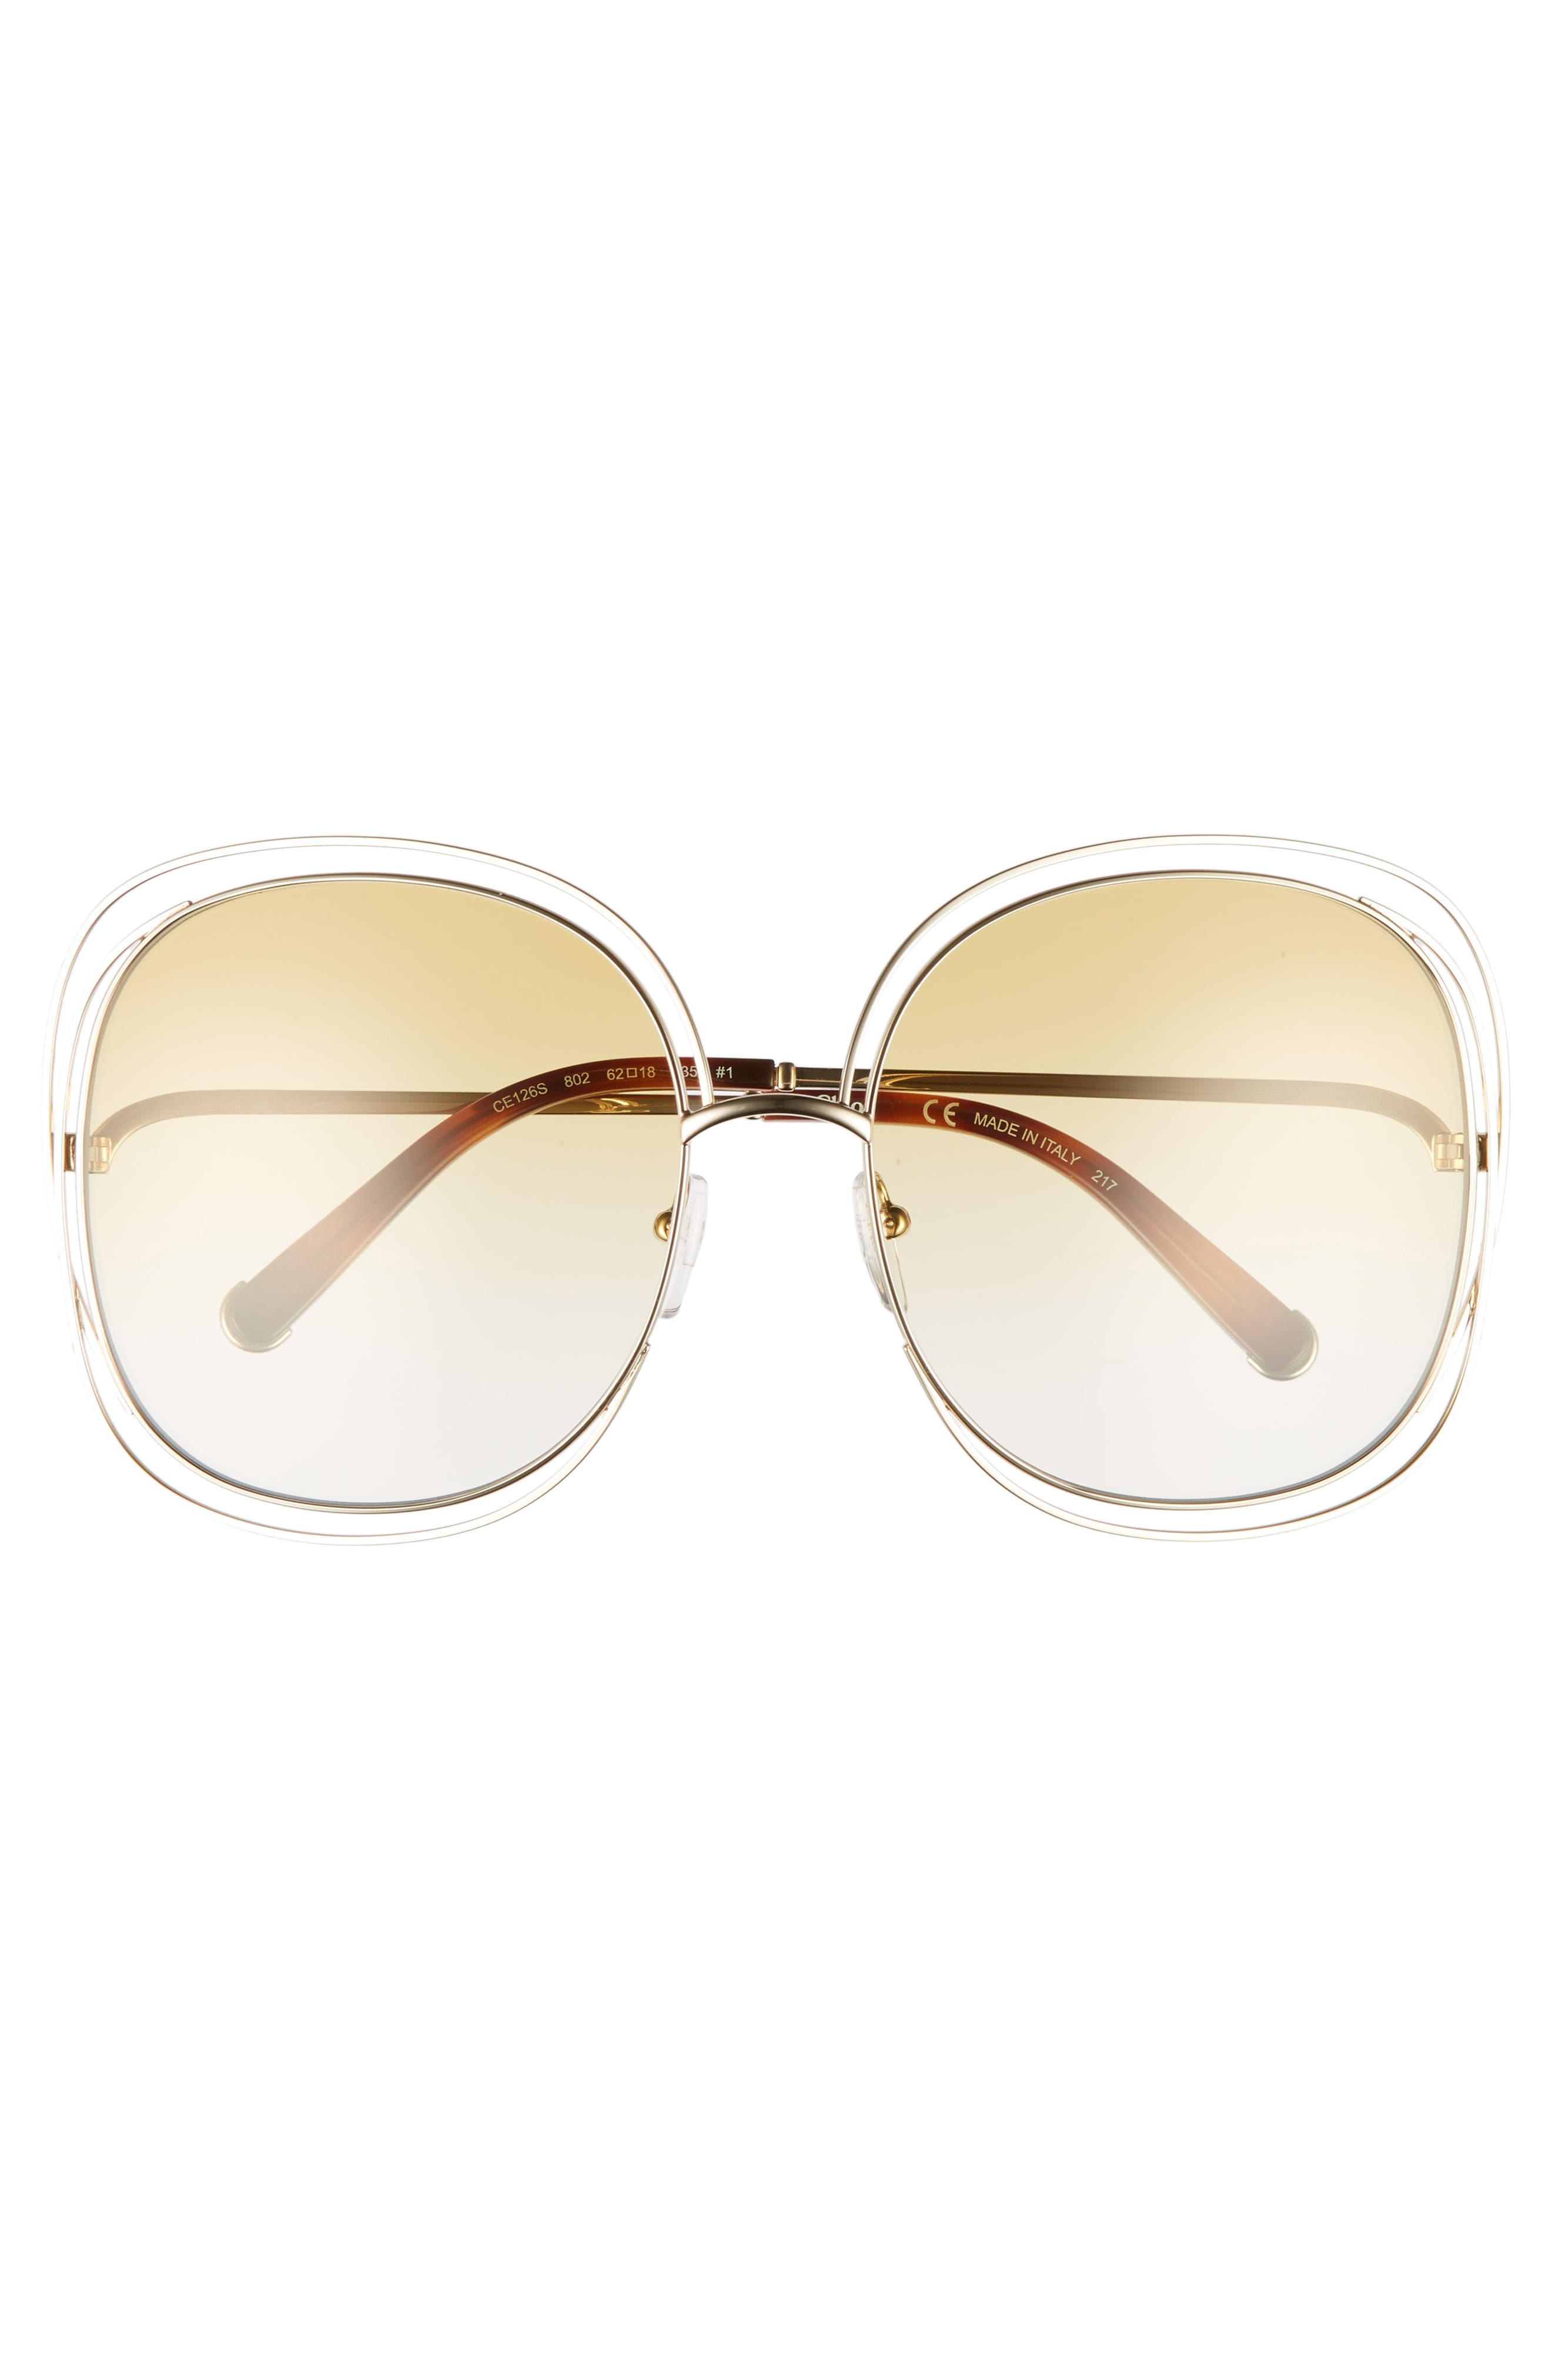 Carlina 62mm Oversize Sunglasses,                             Alternate thumbnail 3, color,                             714